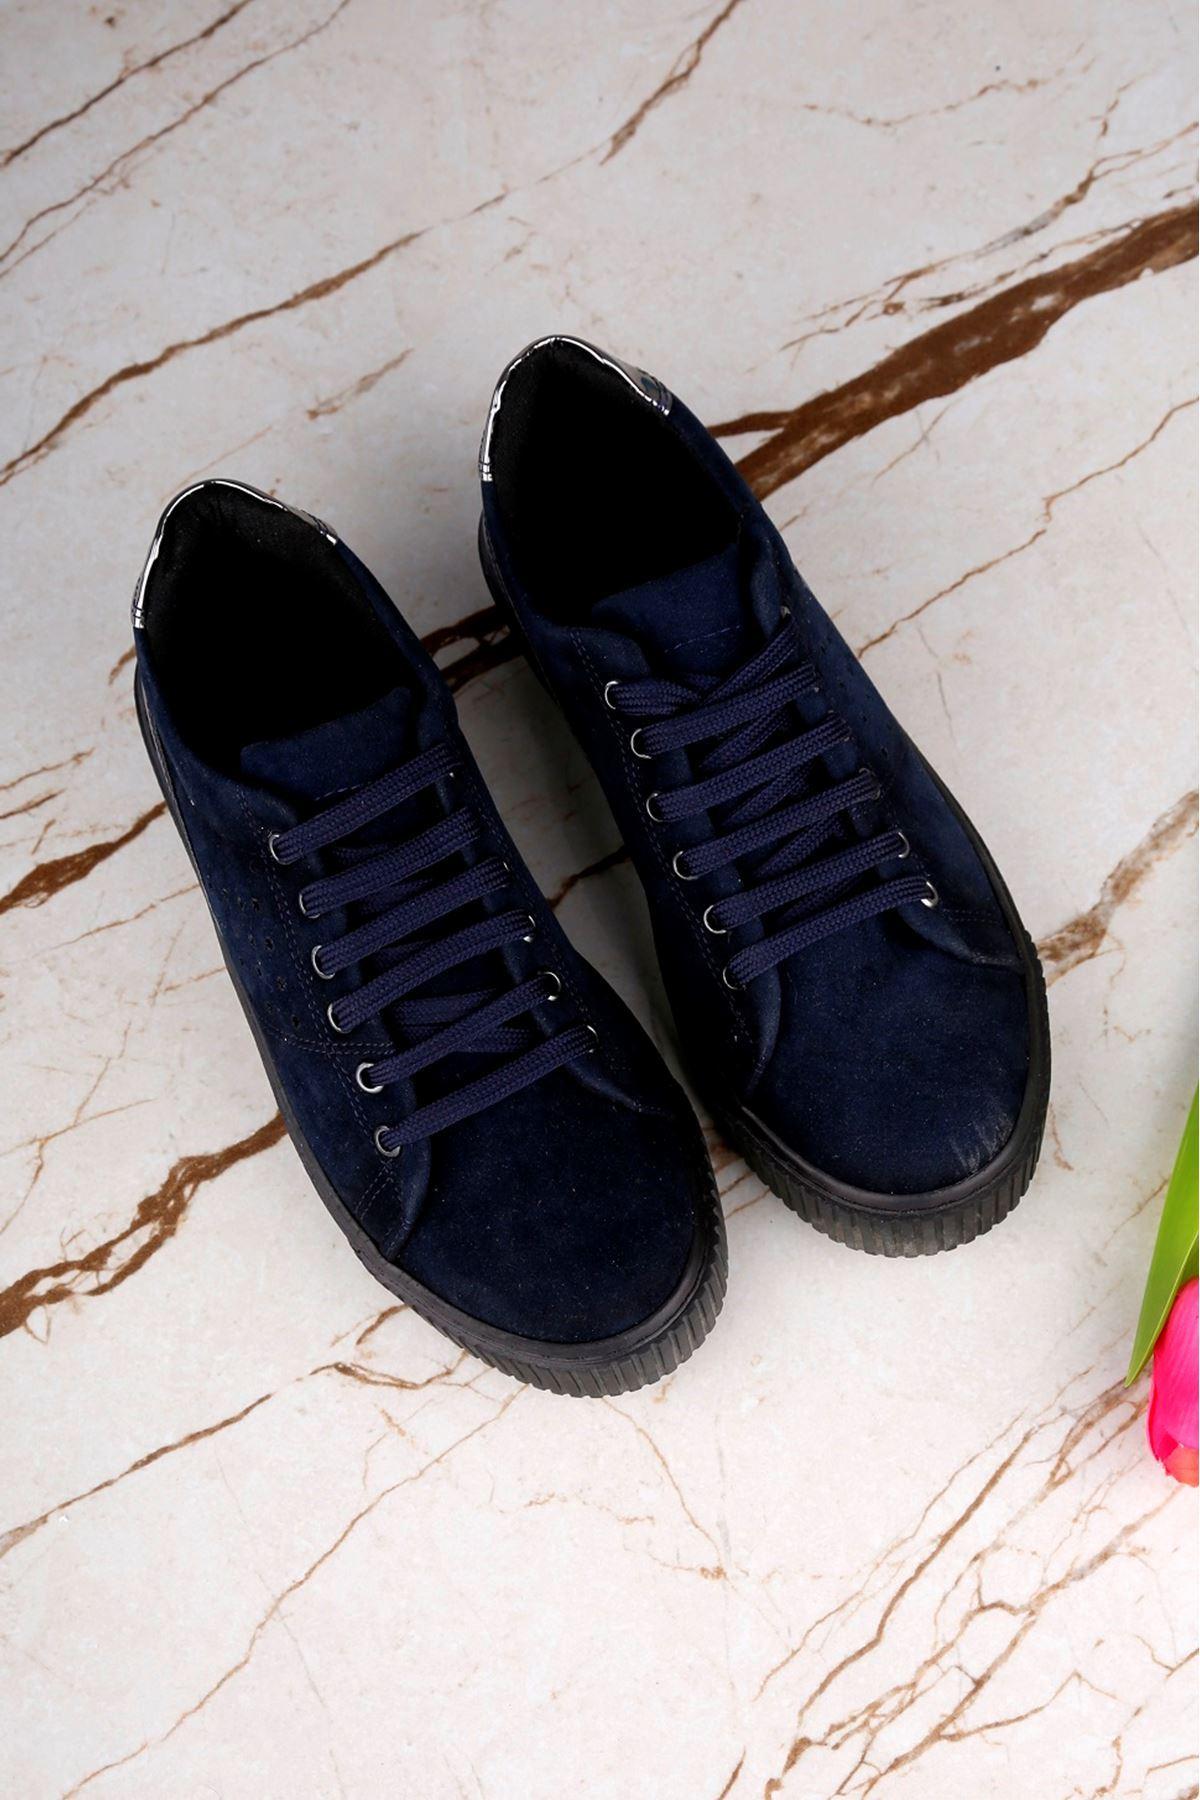 HILL Lacivert Süet Ayakkabı